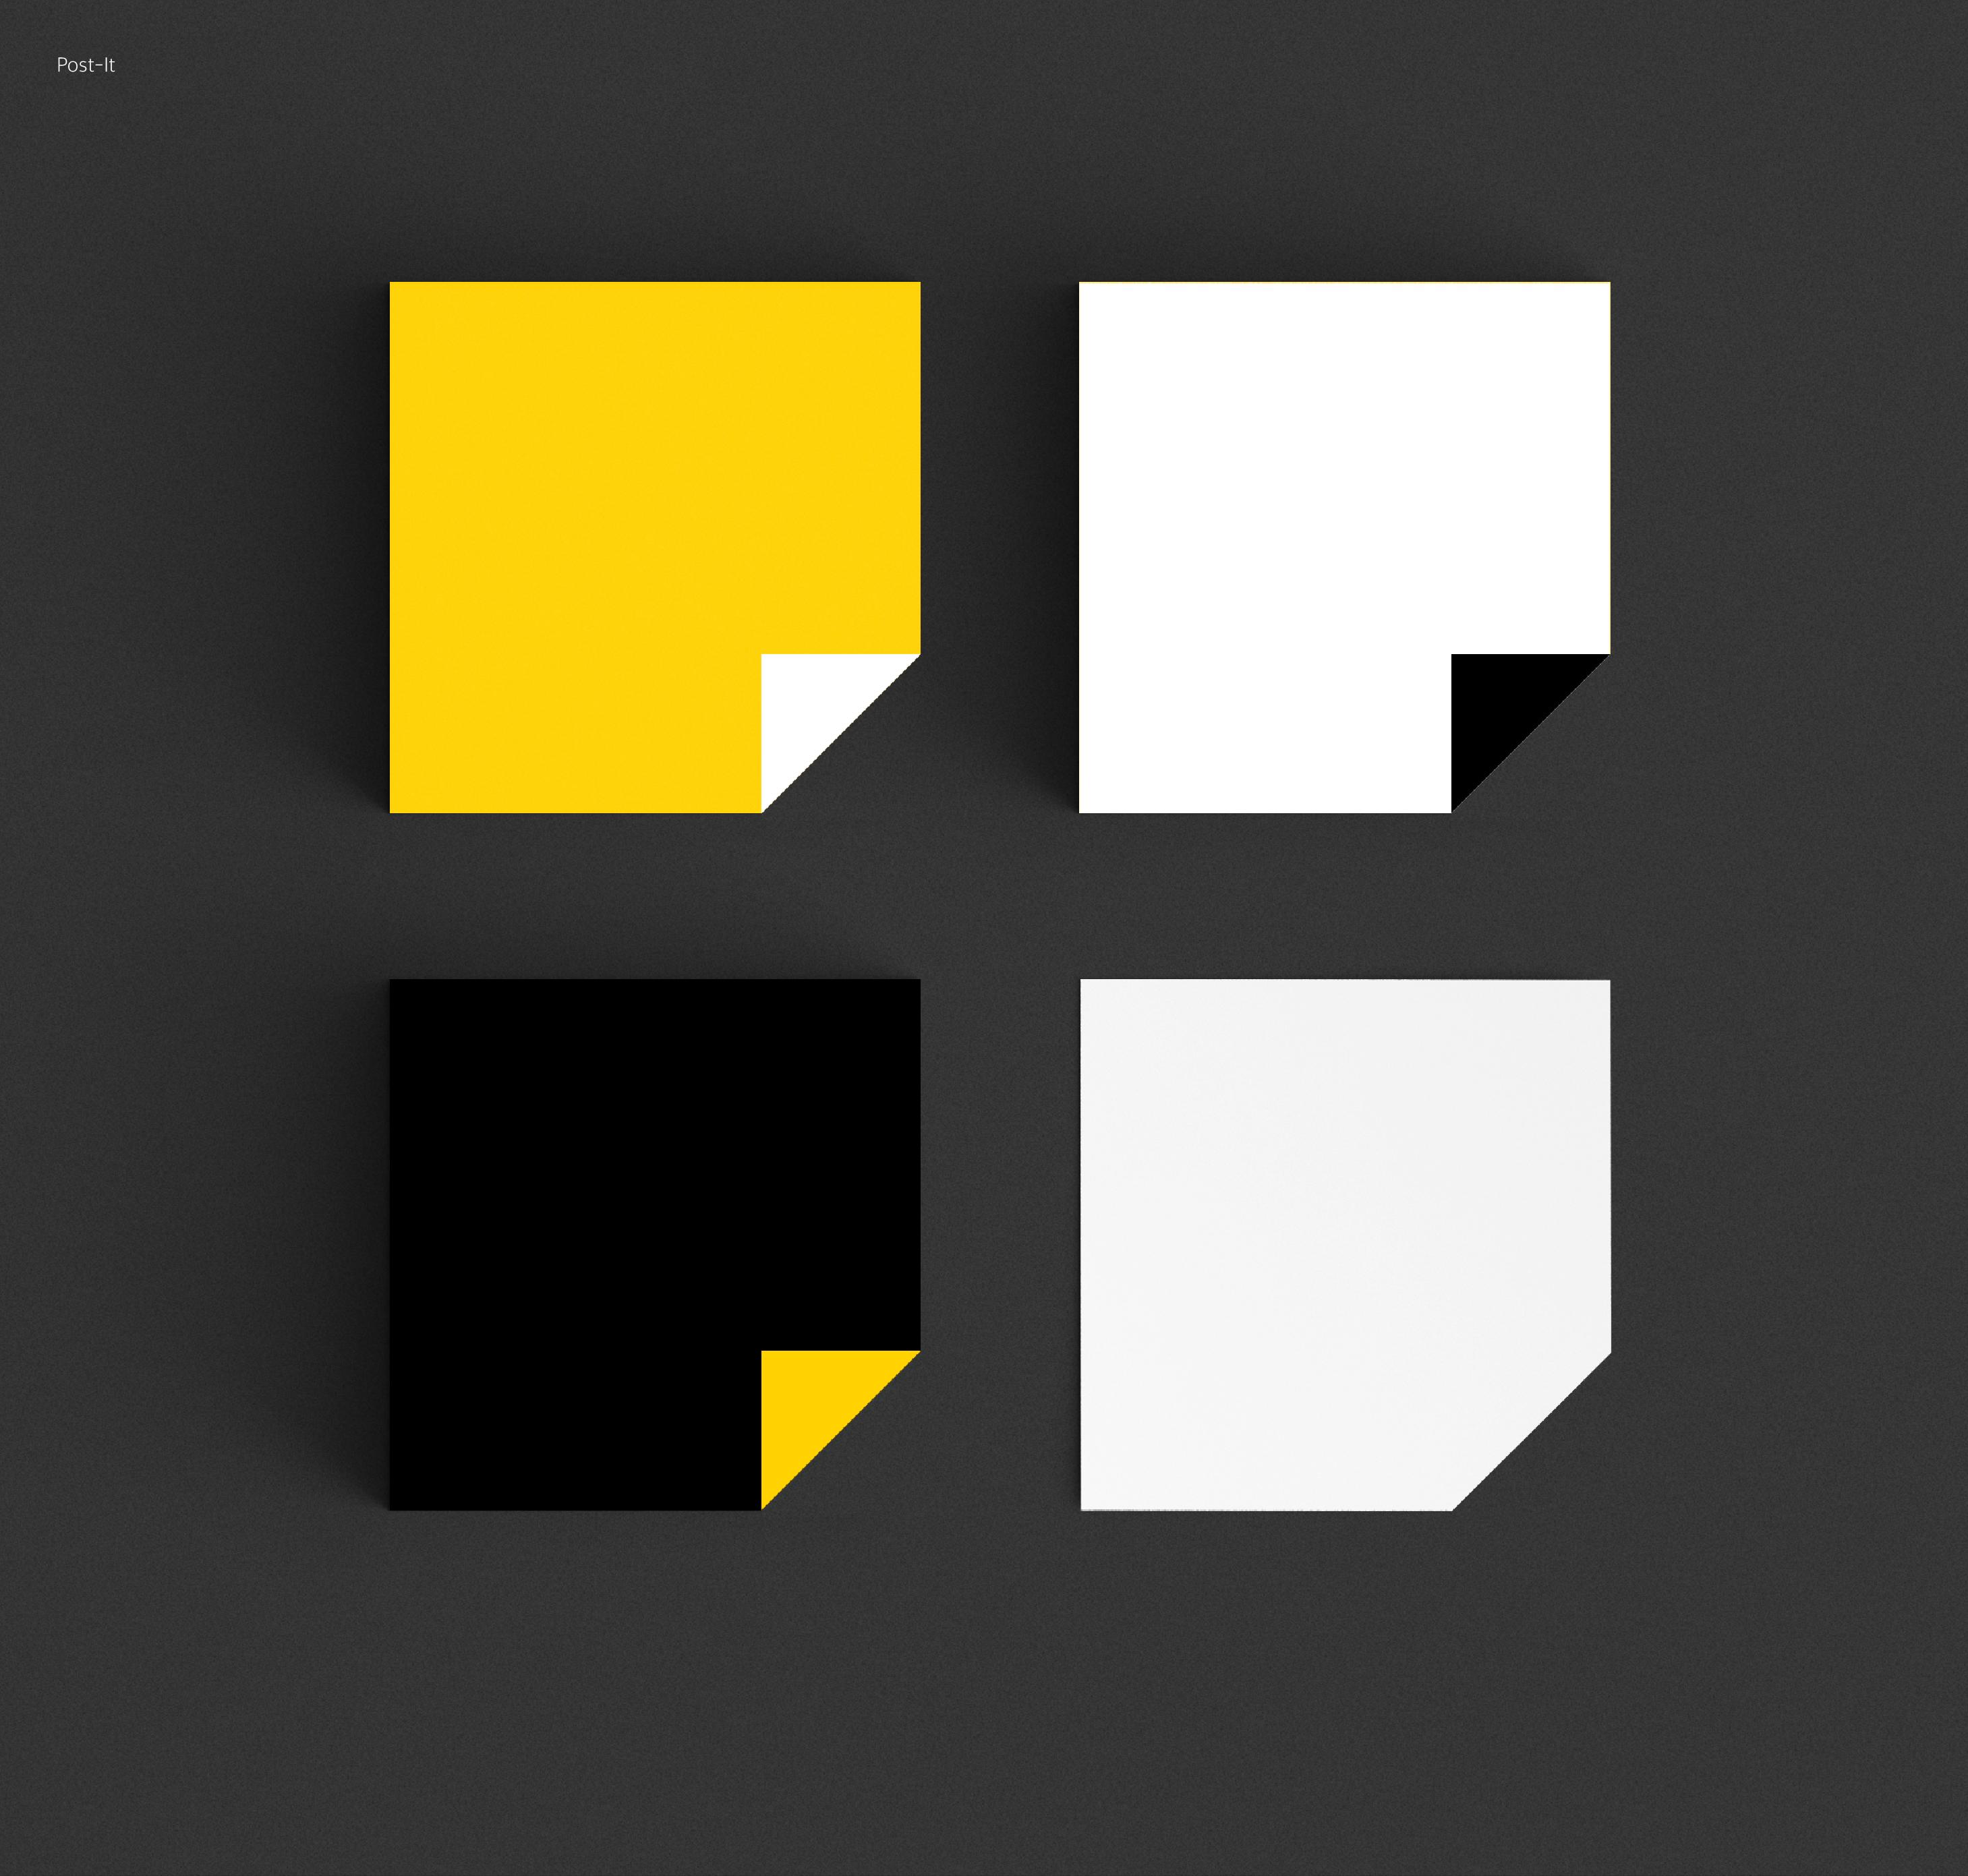 kakaopage-Brand-eXperience-Design-Renewal-38